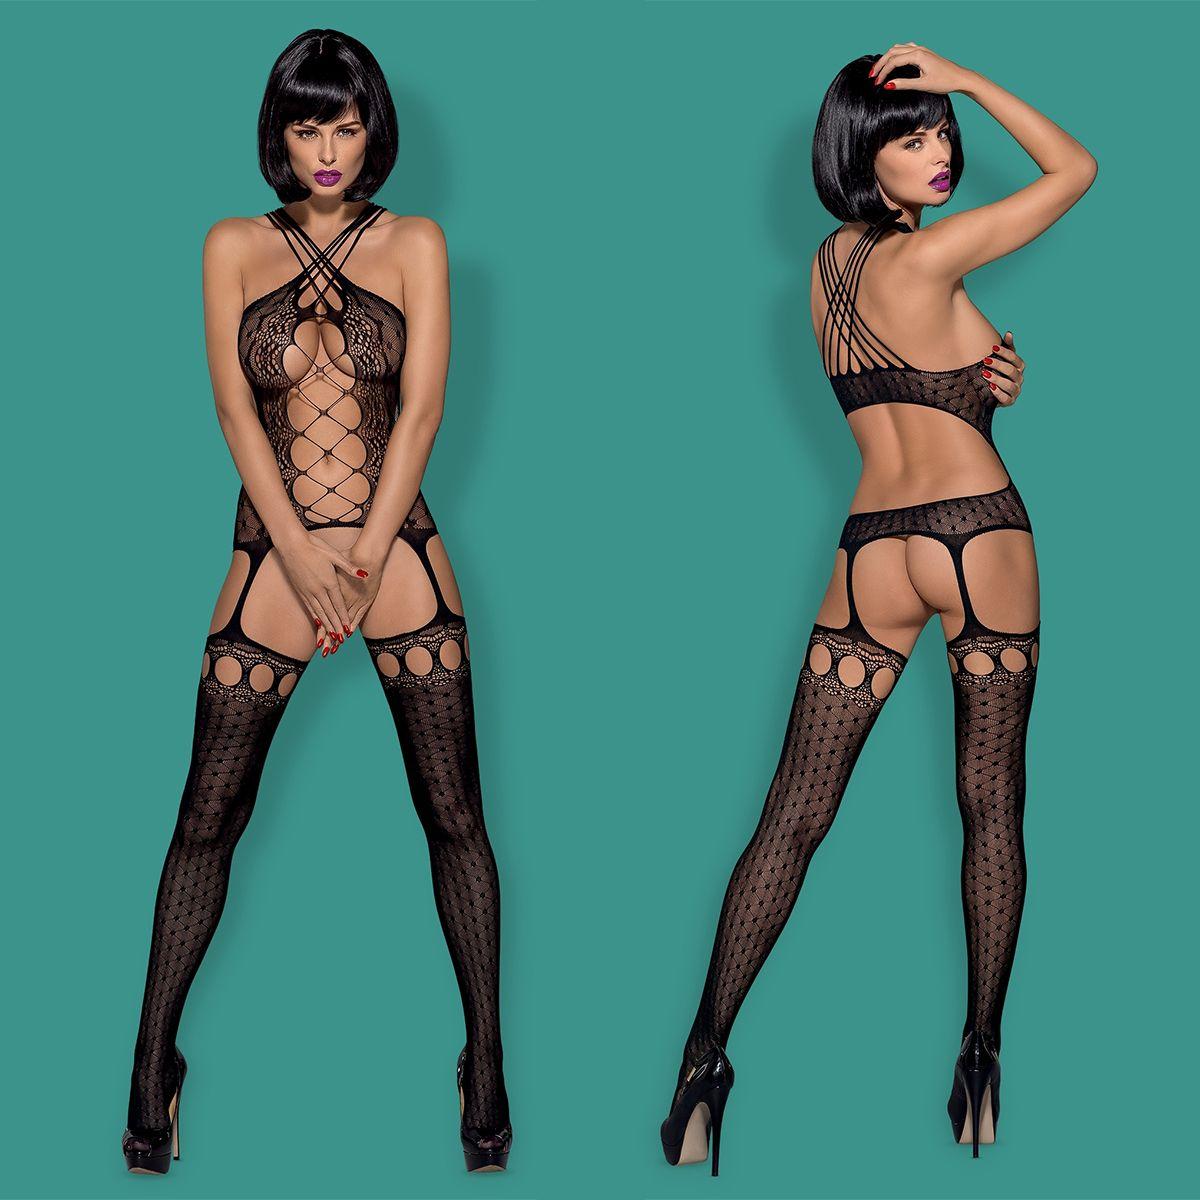 porn Netz-Bodystocking mit V-Ausschnitt you